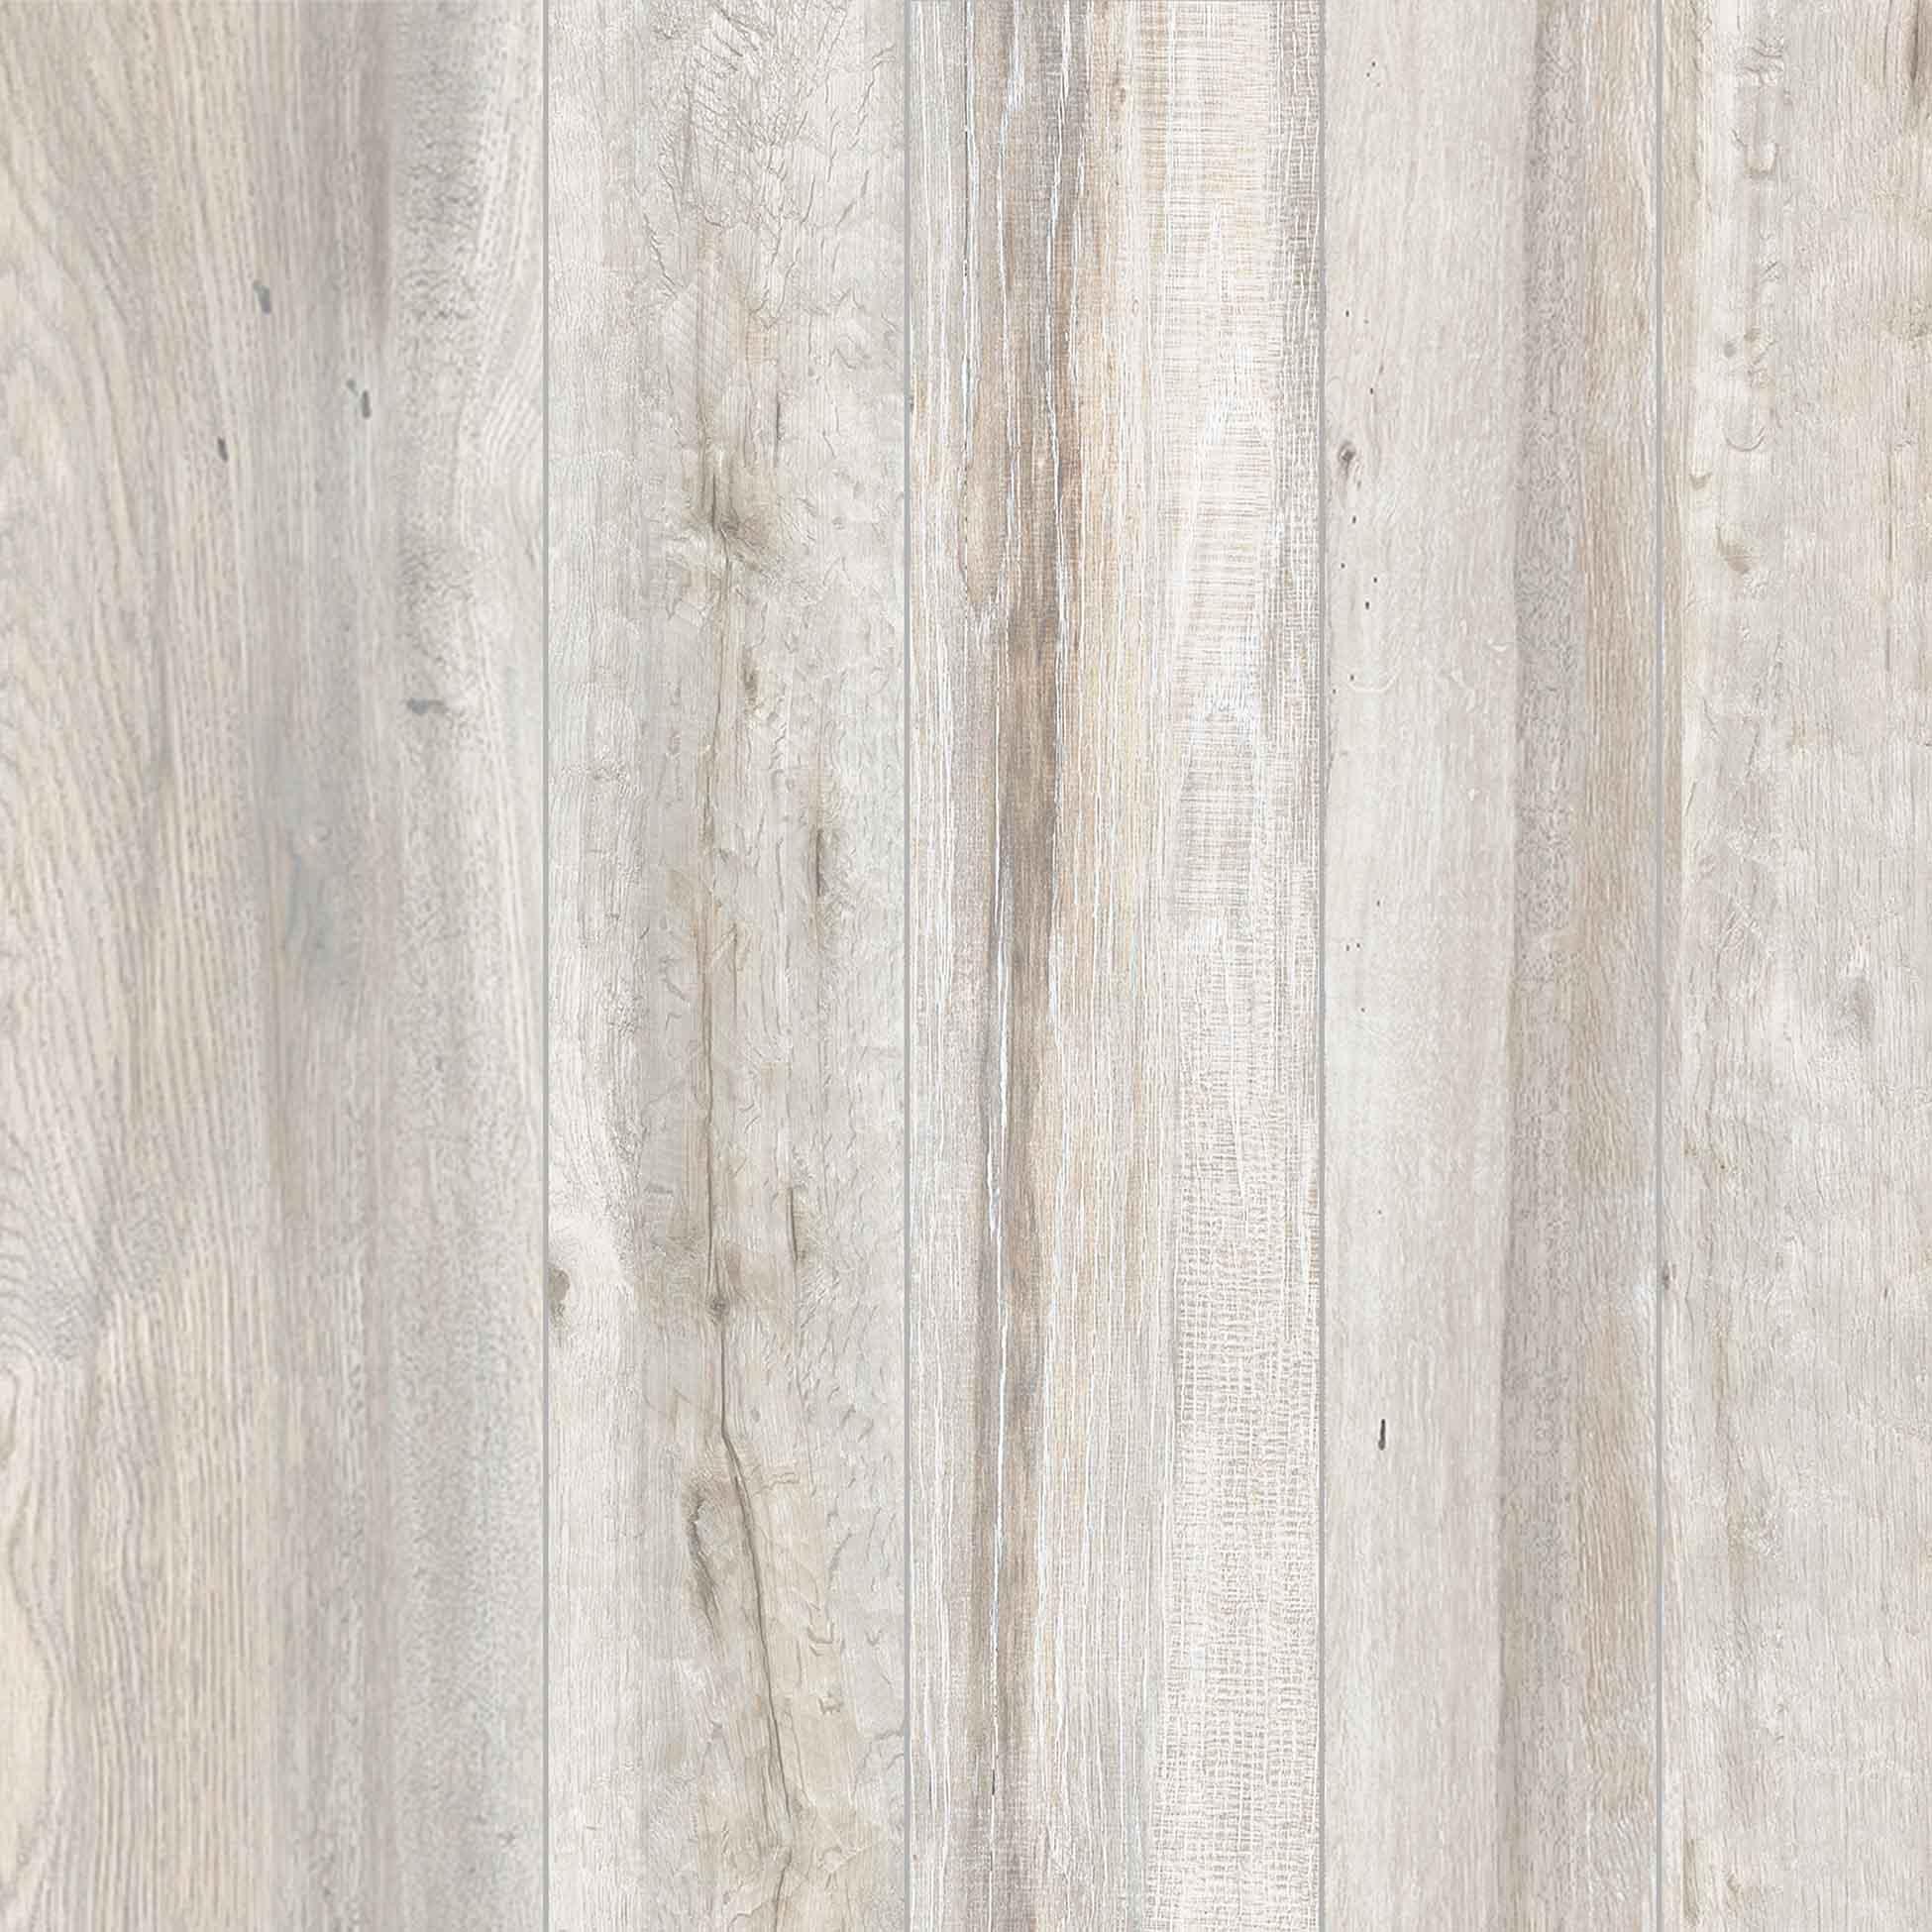 Details Wood White Grip 20mm 60 x 60